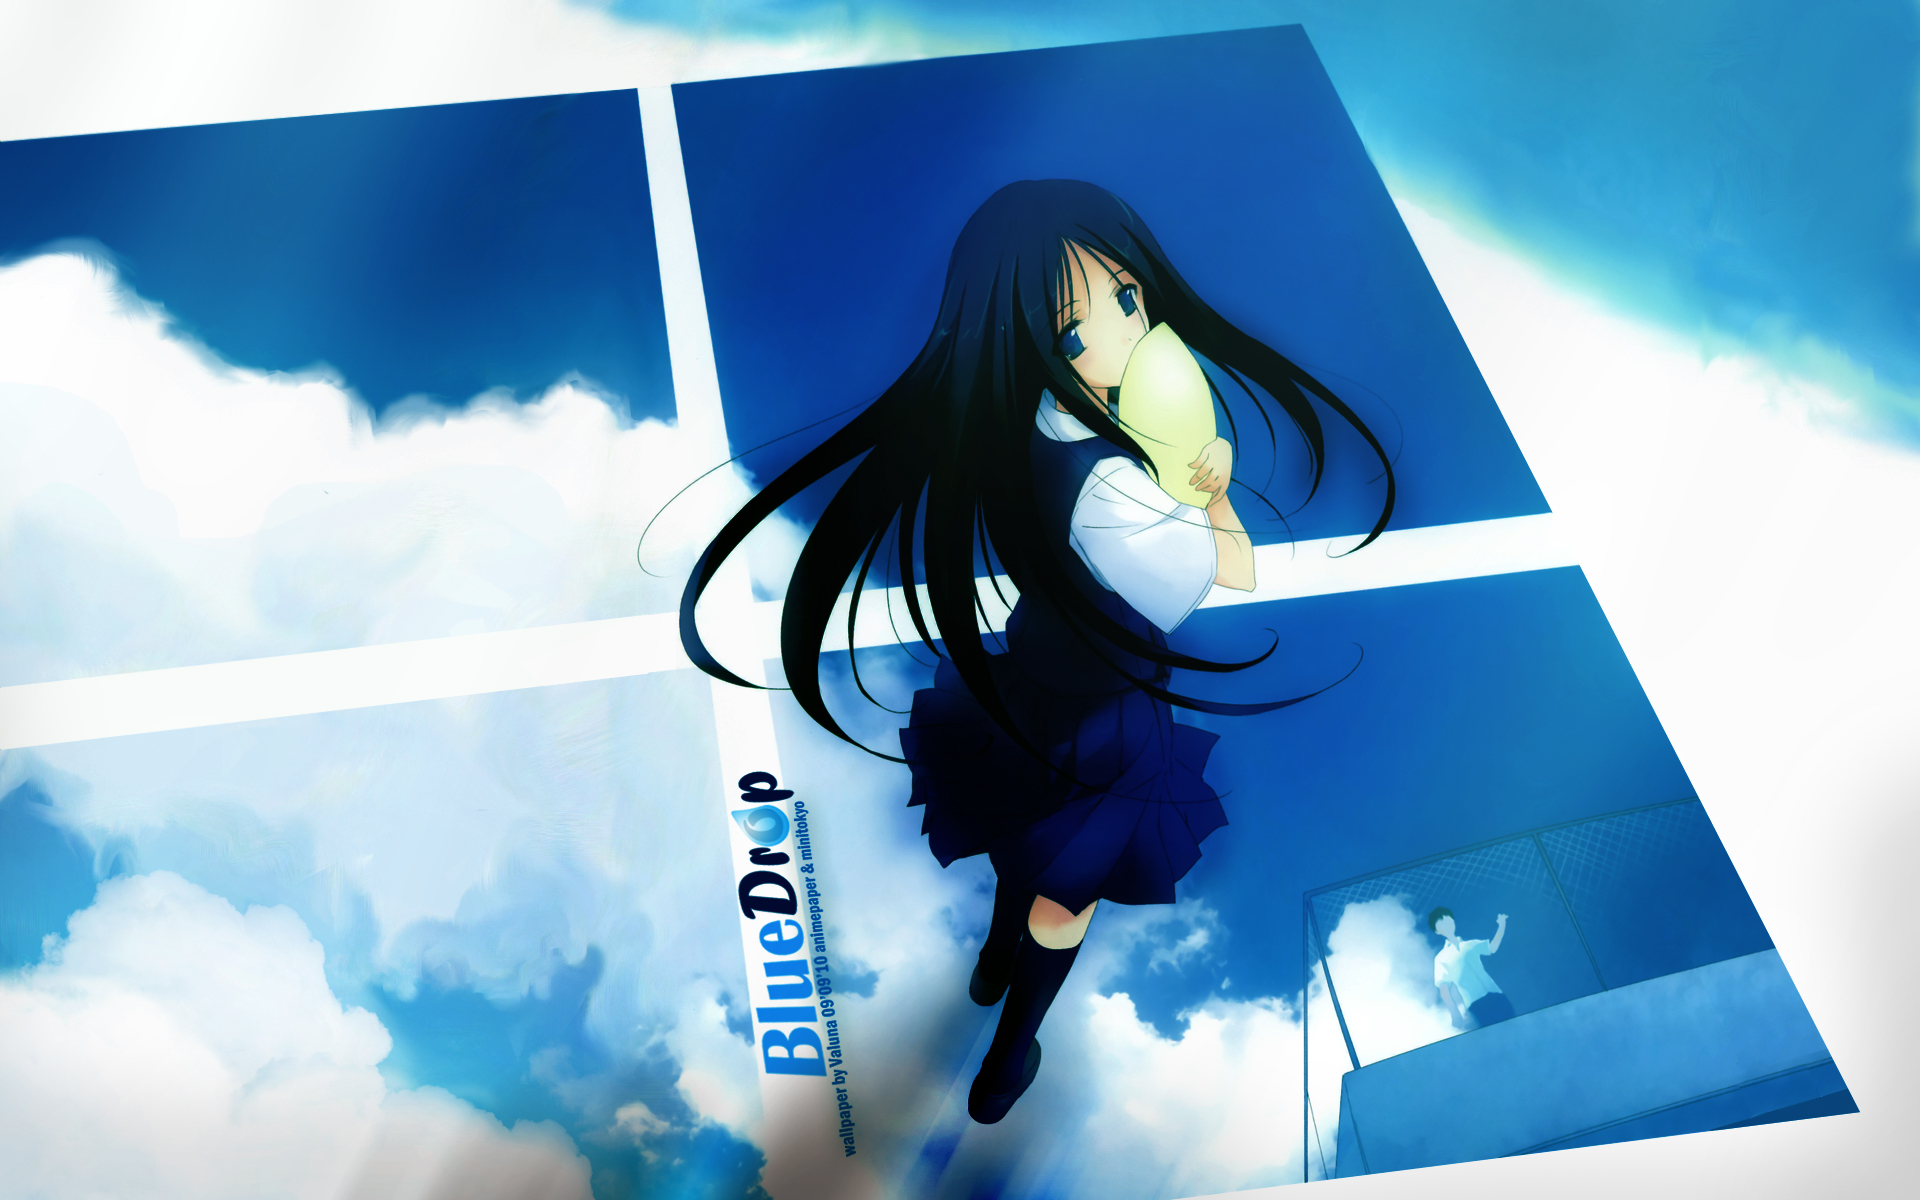 100 Wallpapers de anime HD Konachan-com-83342-blue_eyes-blue_hair-clouds-fujiwara_warawara-long_hair-scenic-sky